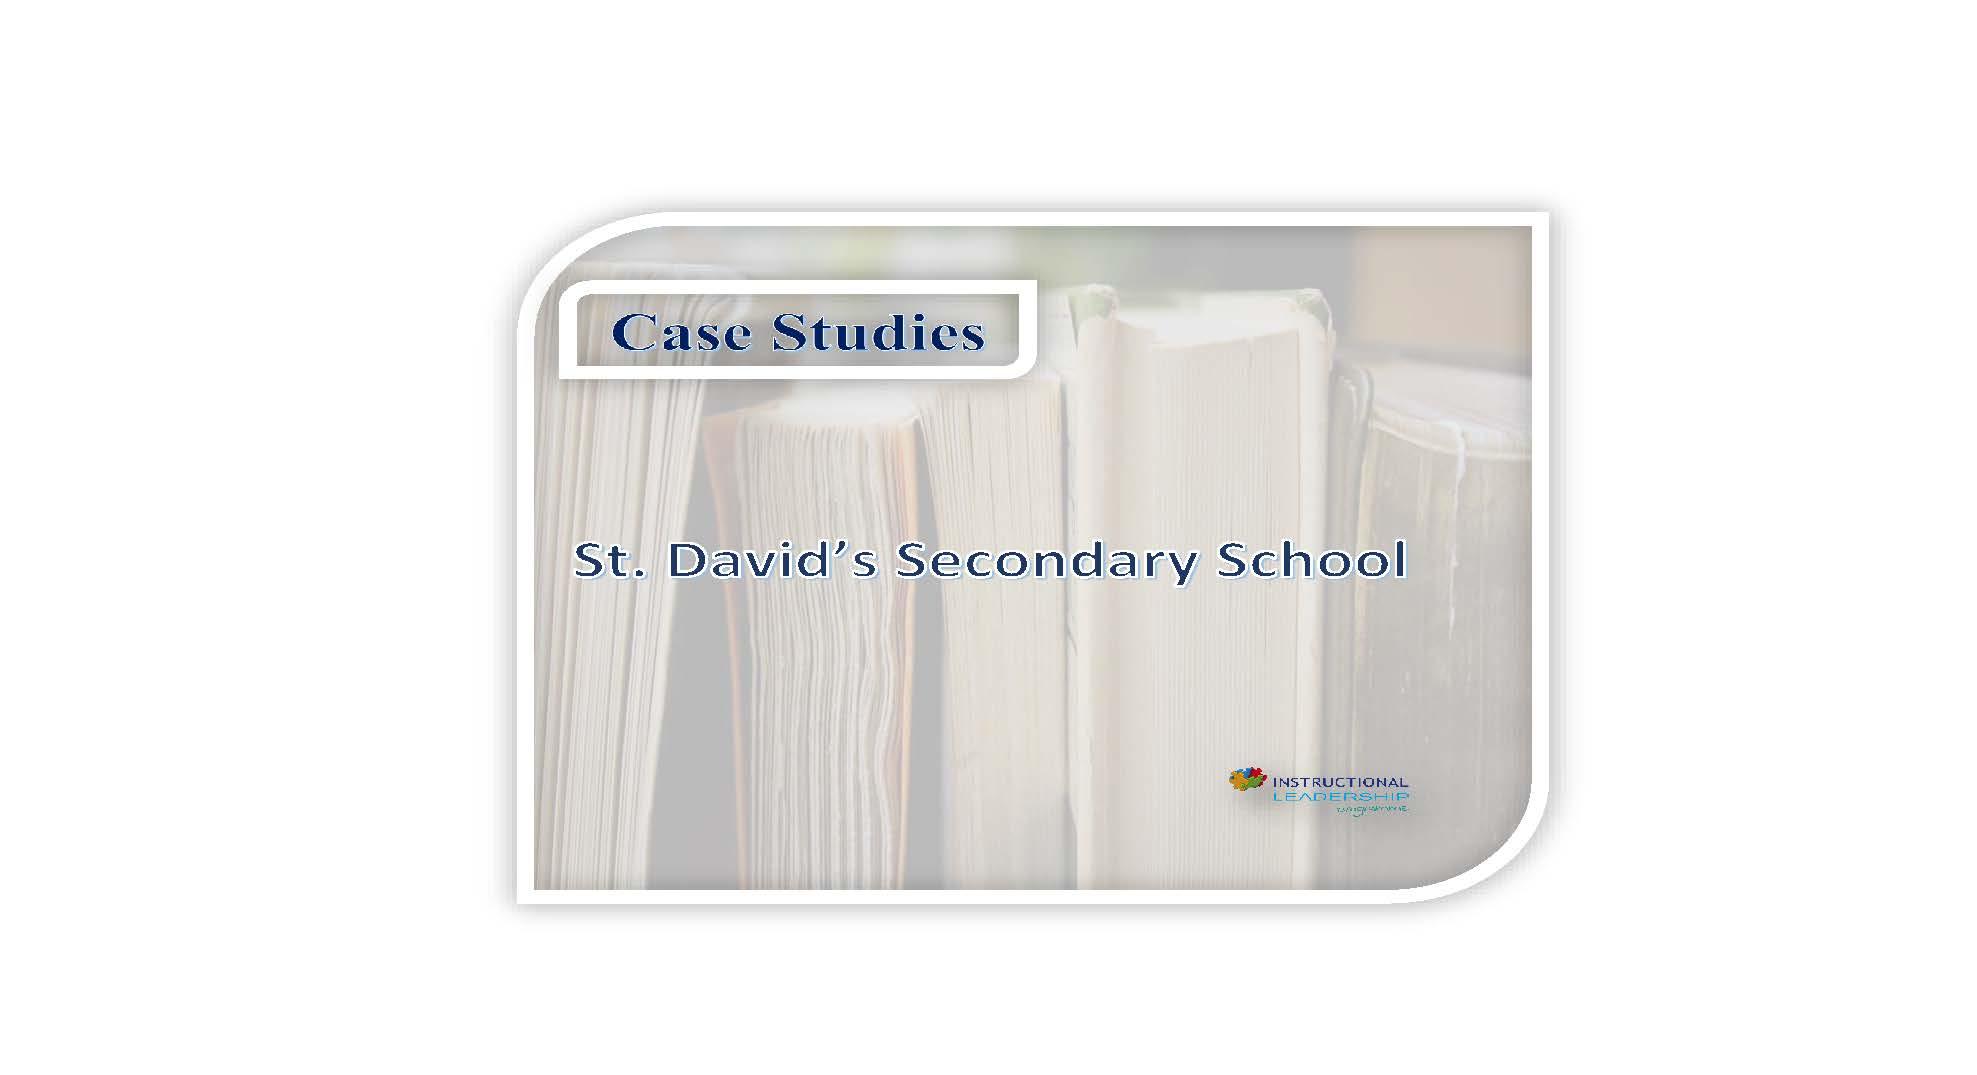 Case Studies – St. David's Secondary School